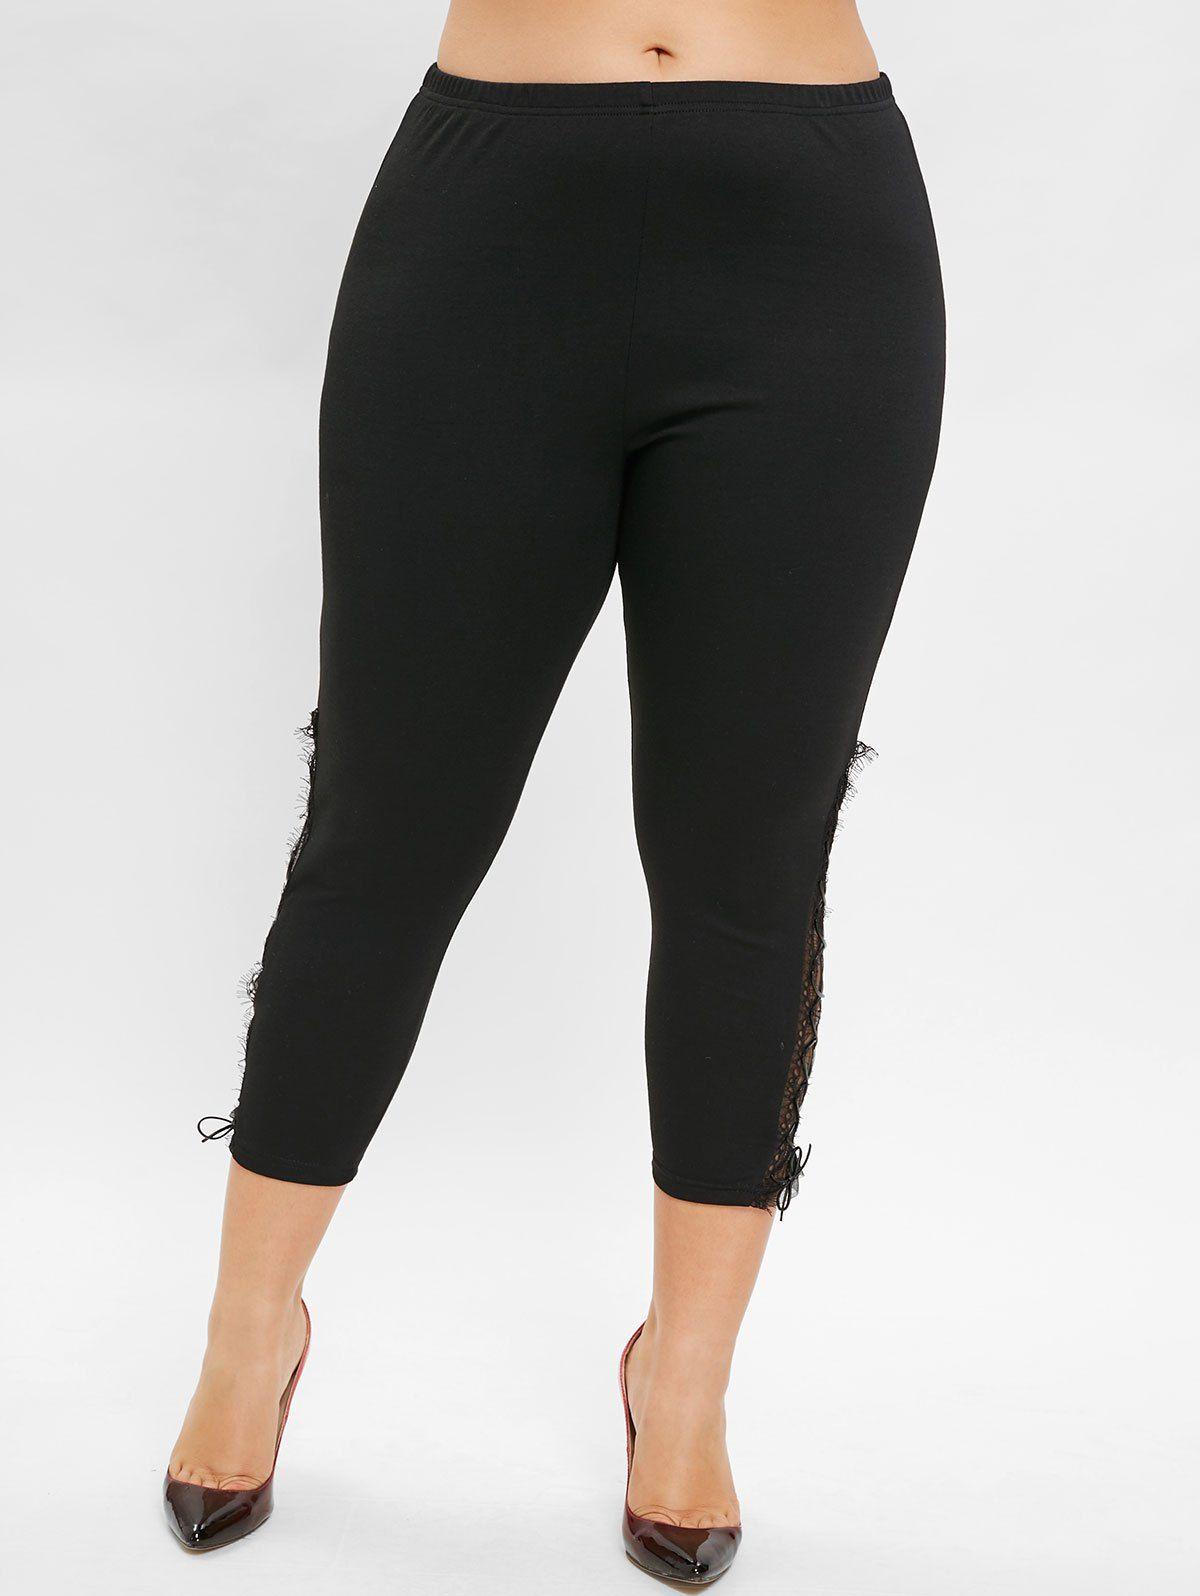 e88efe0d5f7 Plus Size Lace Up Ninth Leggings  leggings outfit casual lazy  leggings  outfit casual